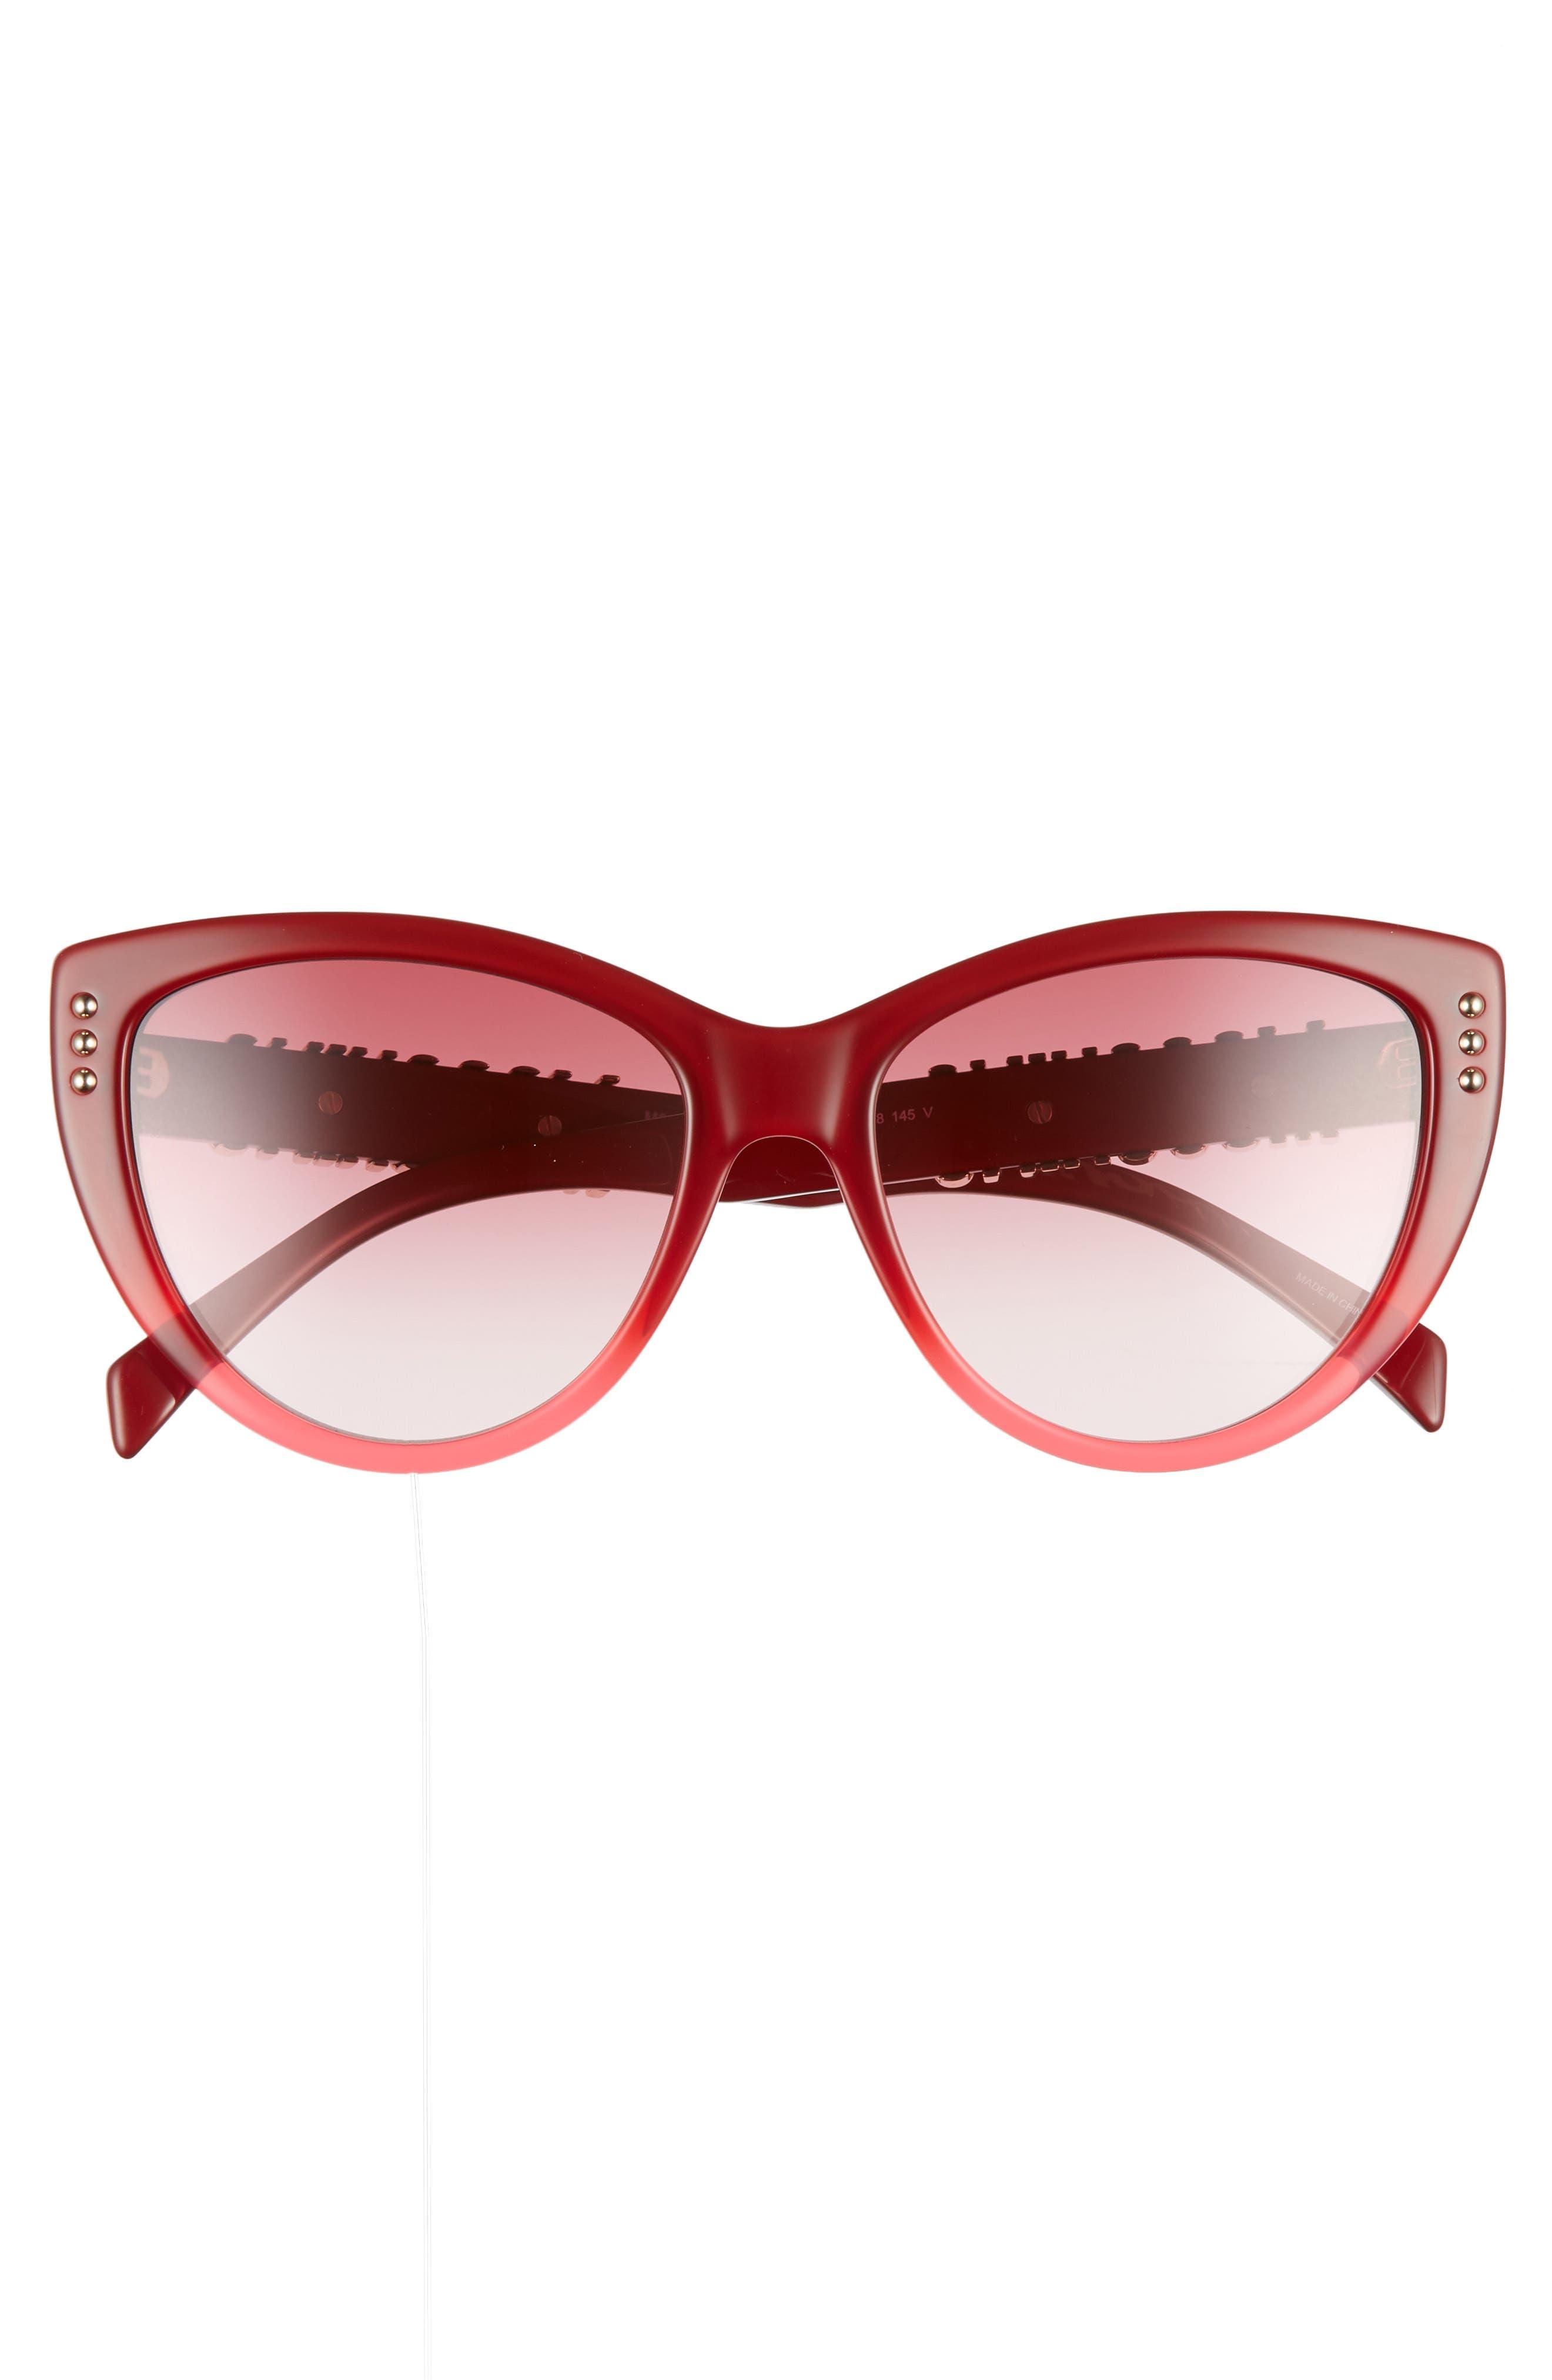 56mm Gradient Cat Eye Sunglasses,                             Alternate thumbnail 3, color,                             RED